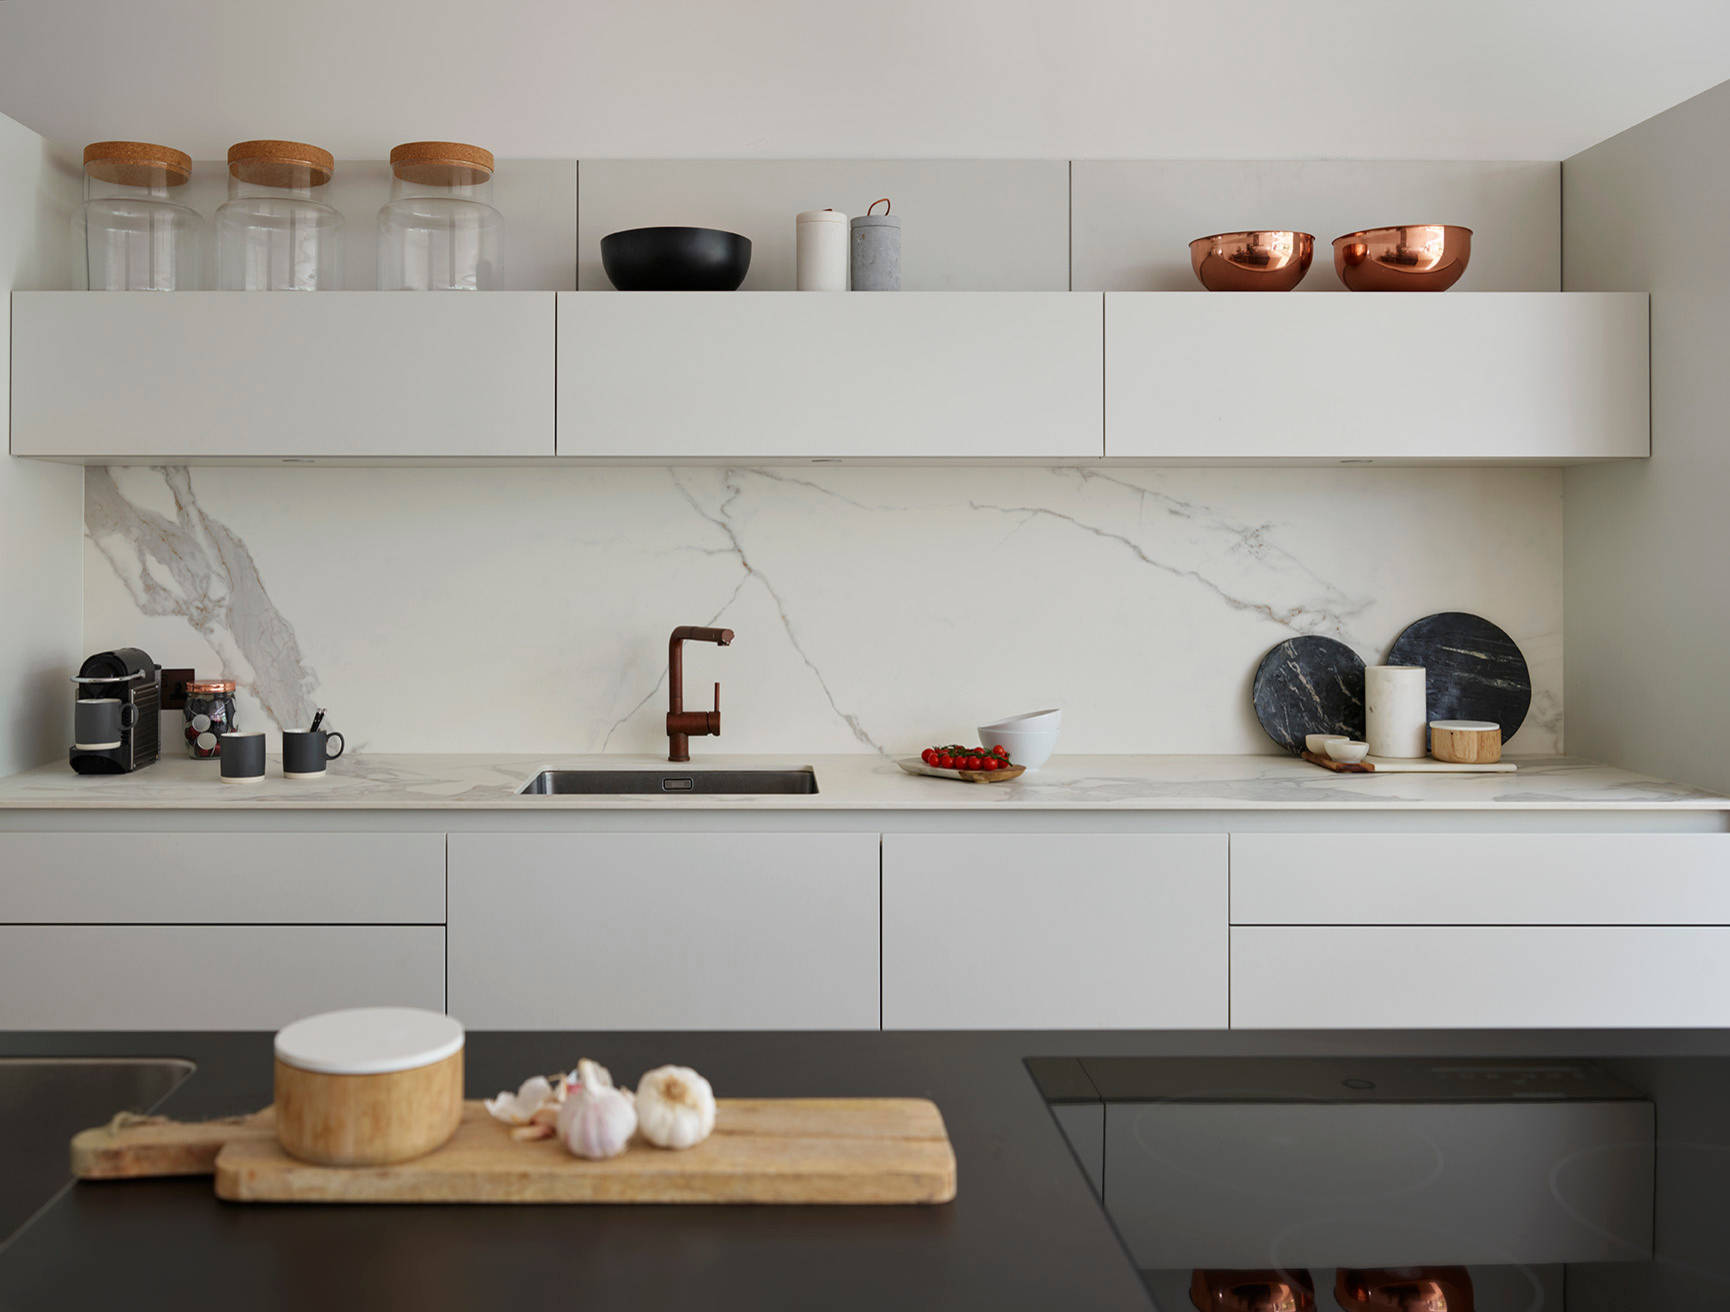 Splashbacks That Look Good With a White Kitchen   Houzz UK